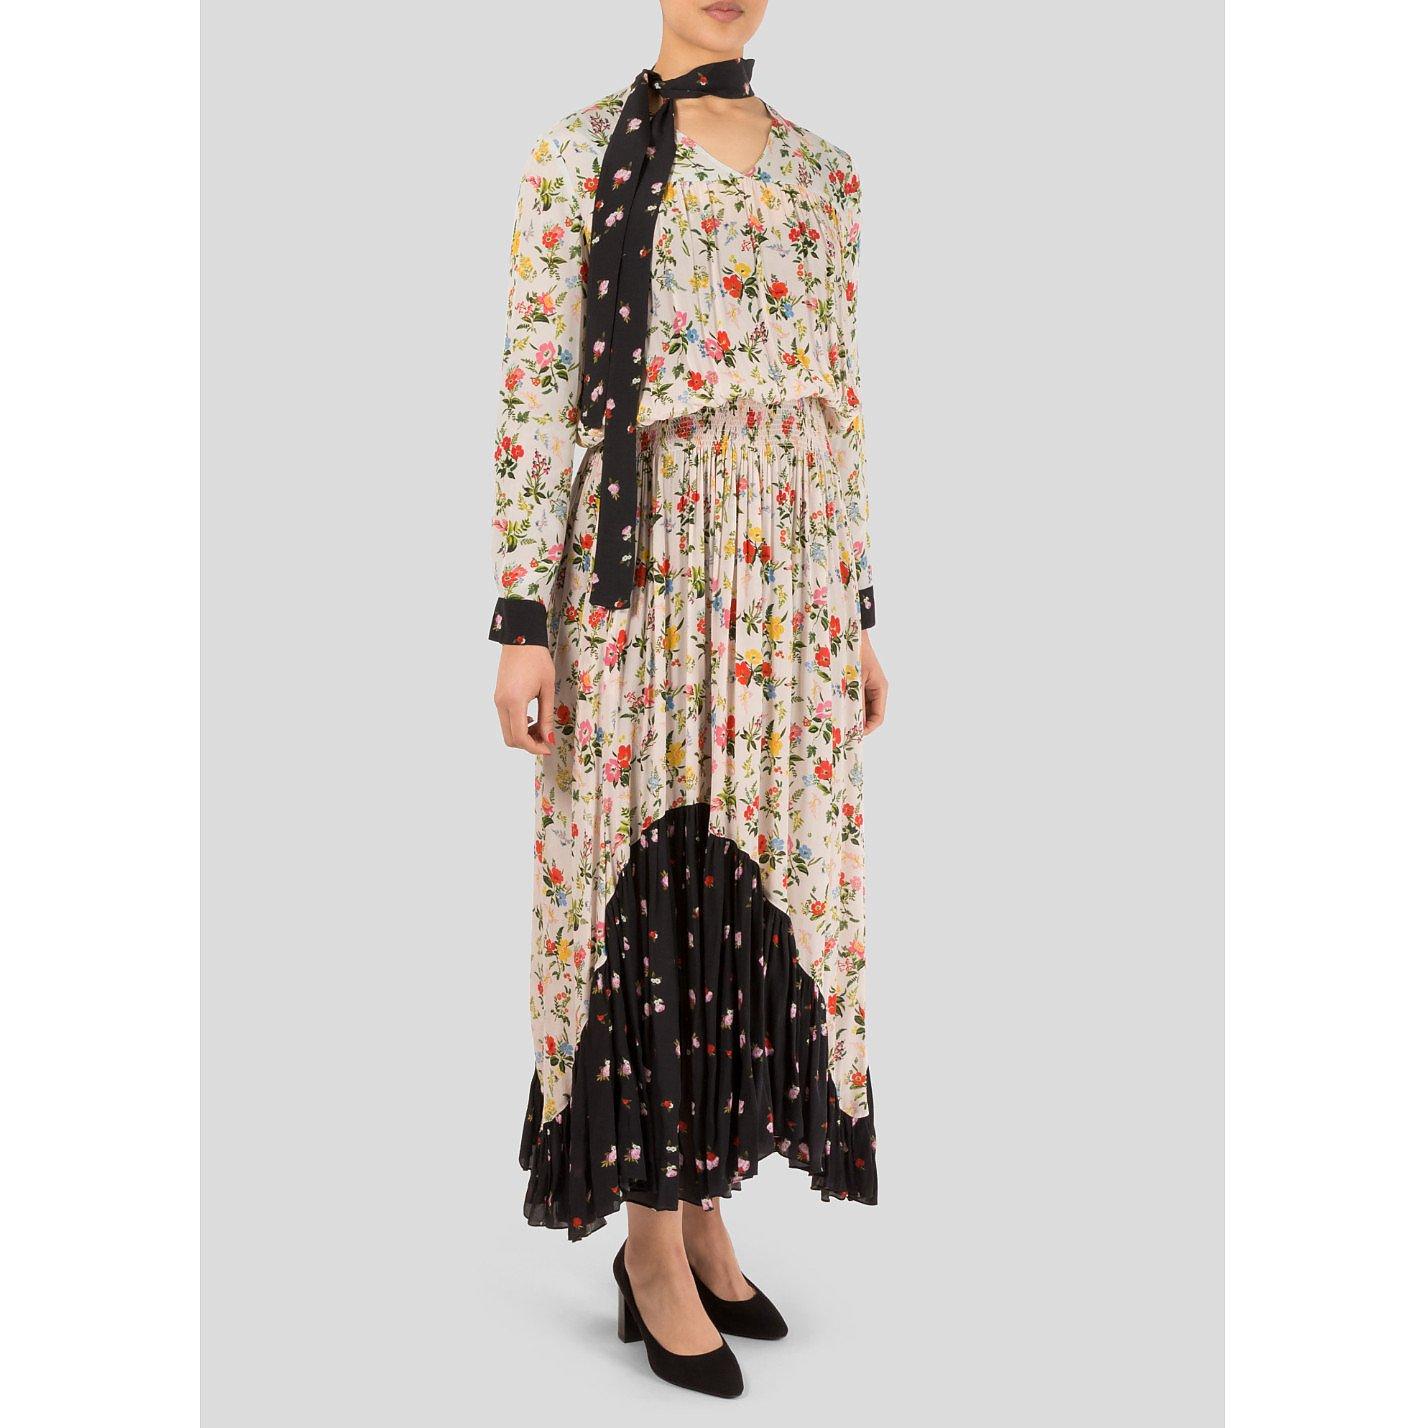 Preen Line Solange Floral Print Crepe Dress